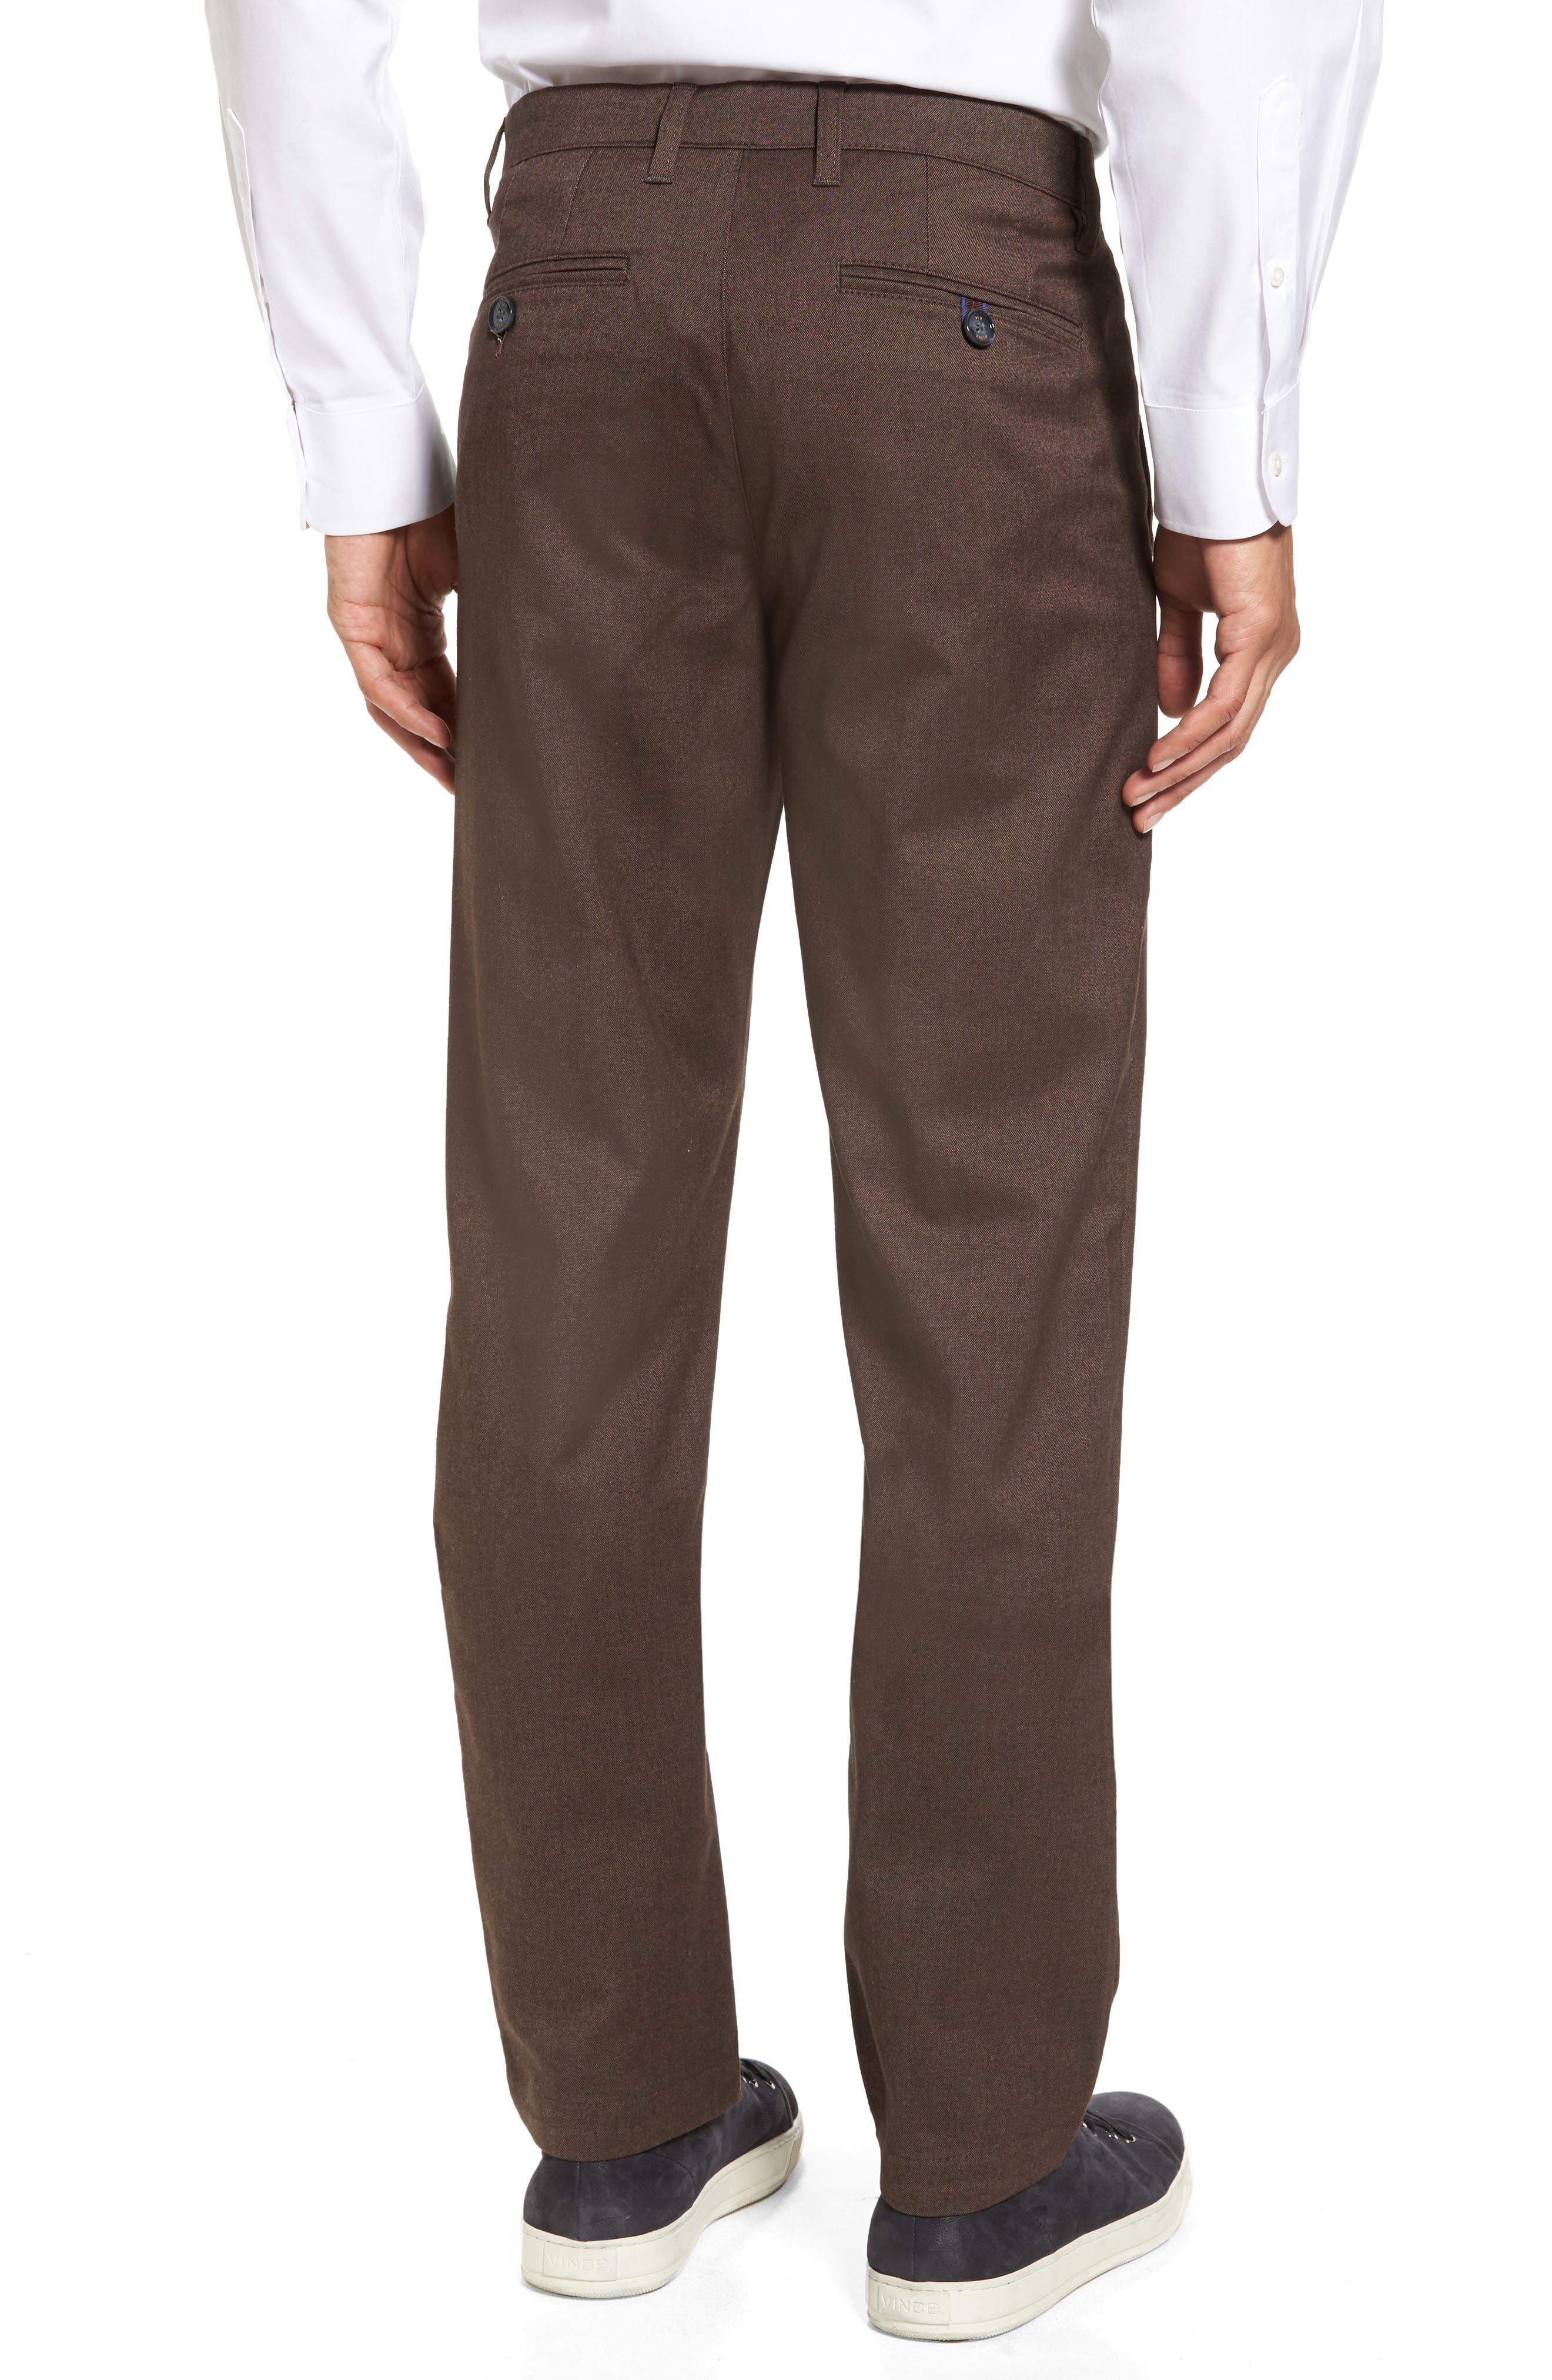 Freshman Modern Fit Brushed Pants,                             Alternate thumbnail 2, color,                             Brown